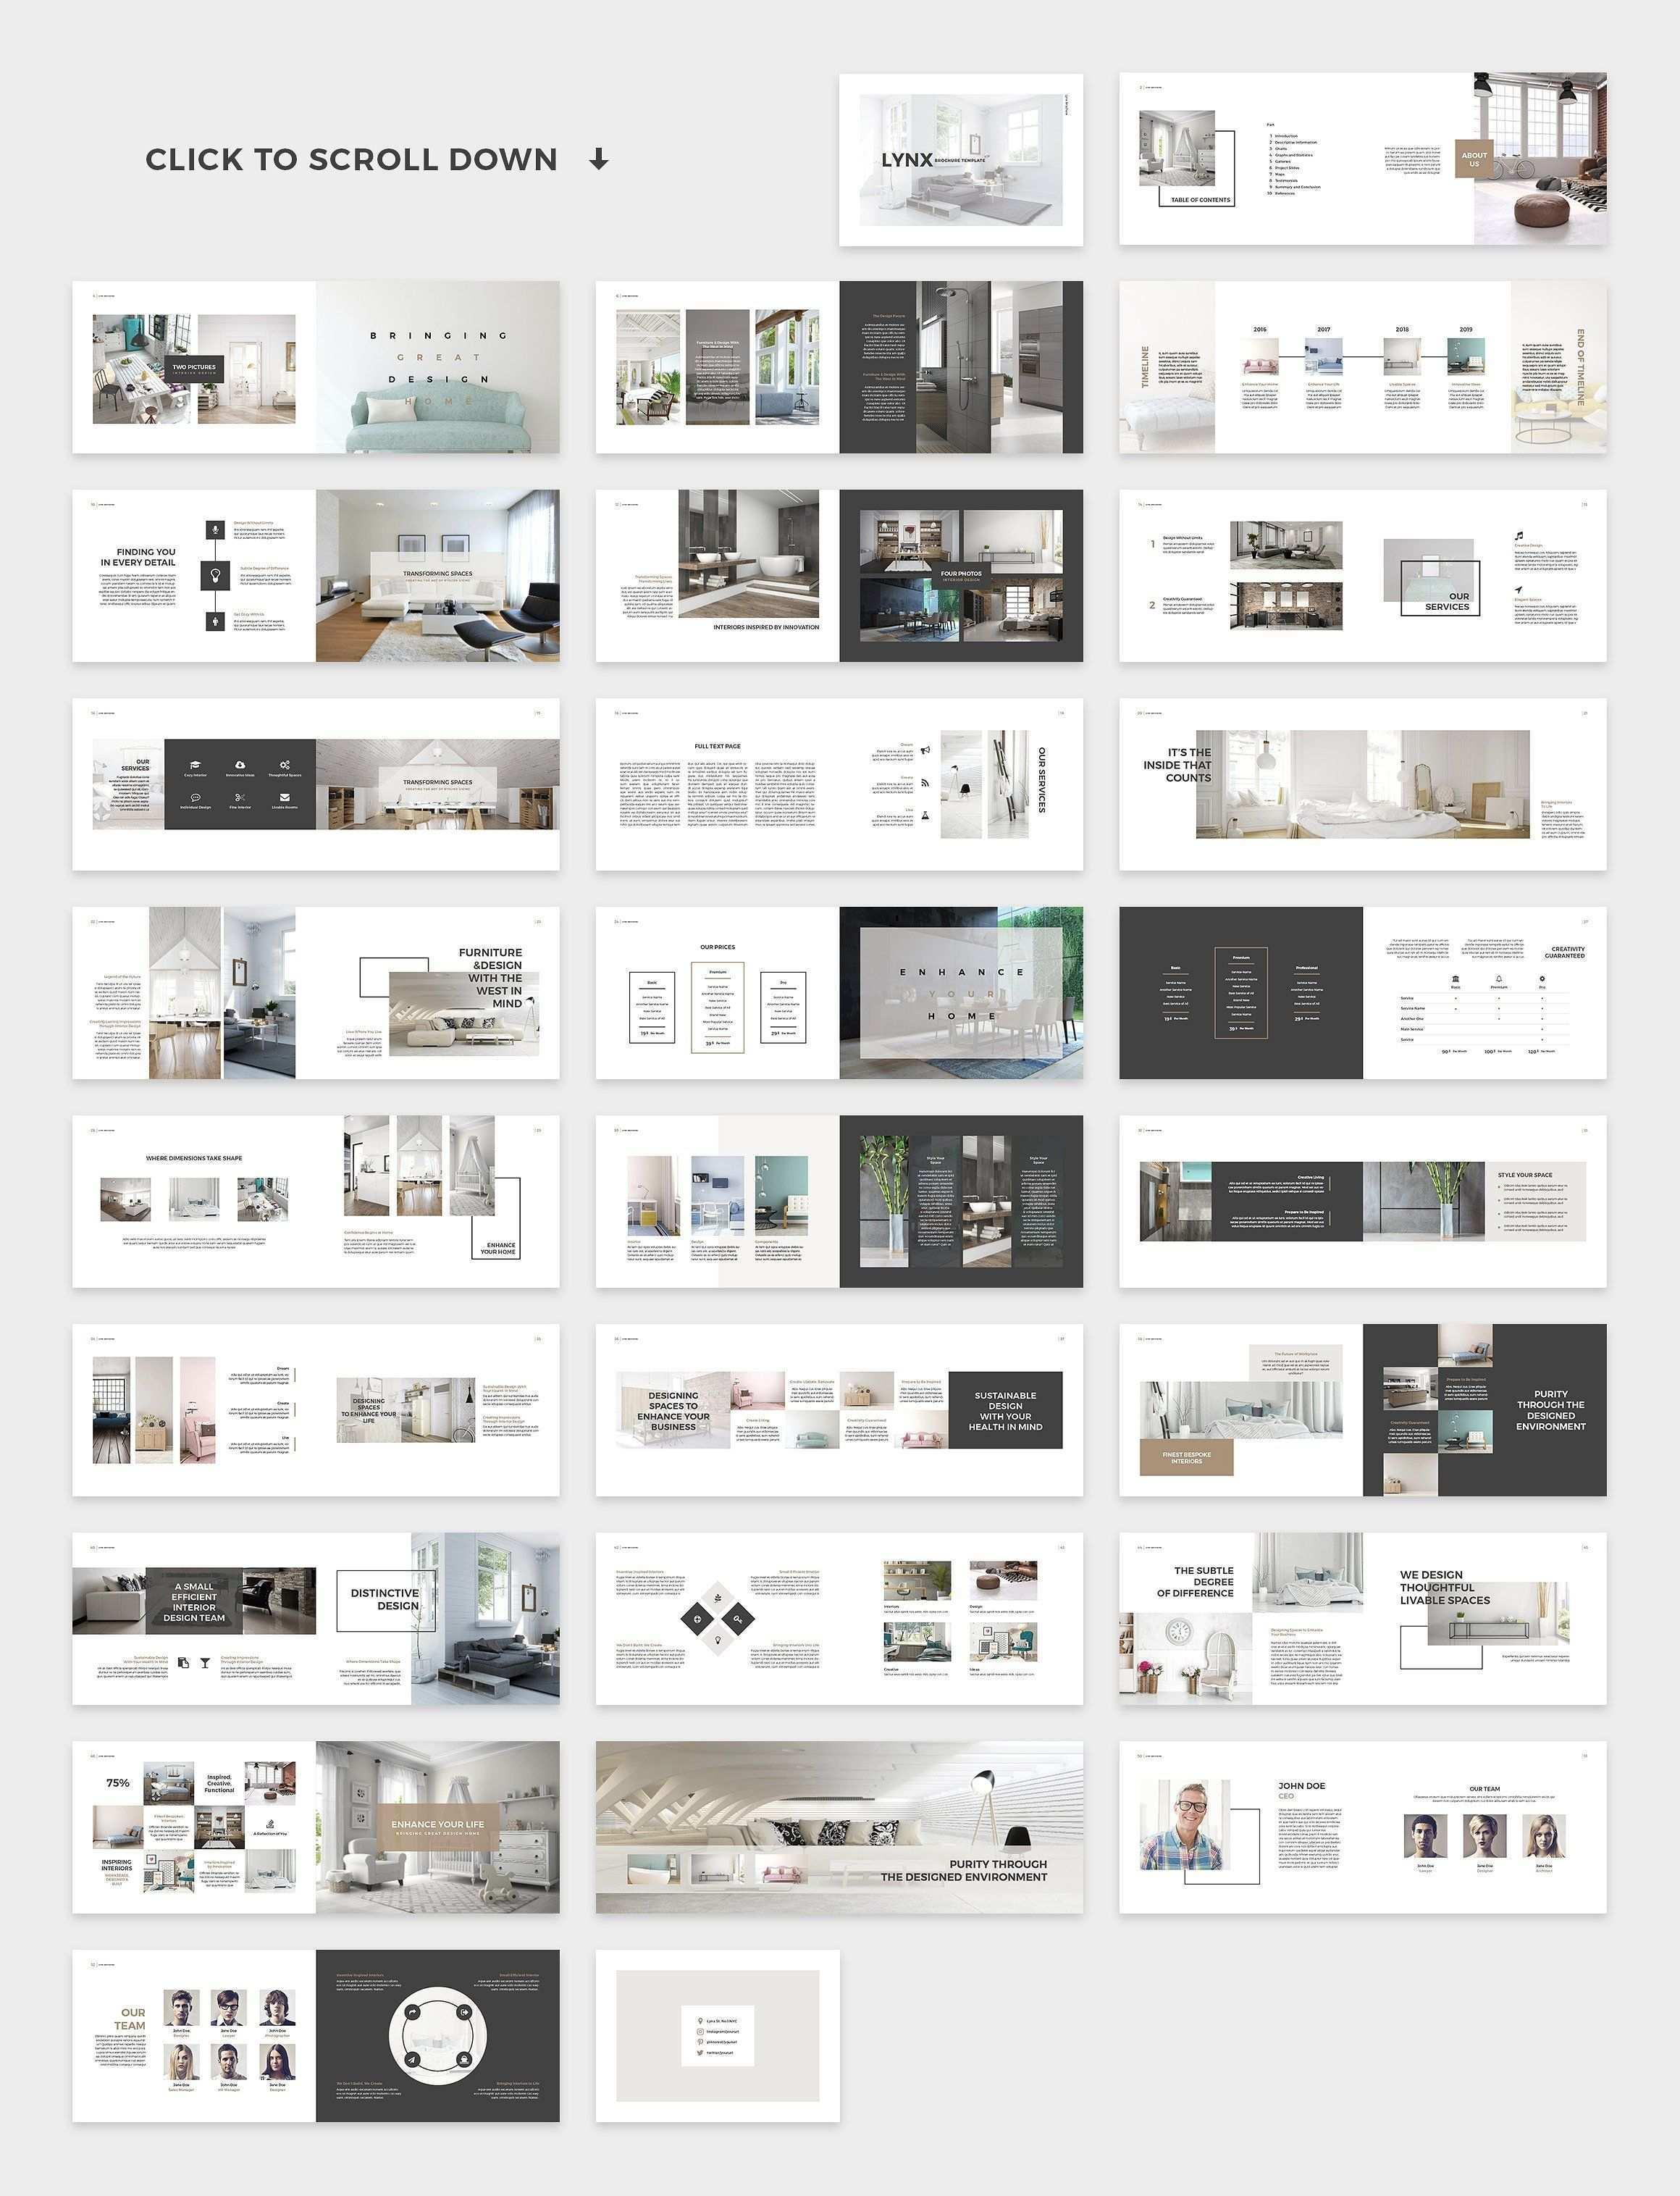 Lynx Brochure Template In 2020 Interior Design Template Architecture Portfolio Layout Catalog Design Layout